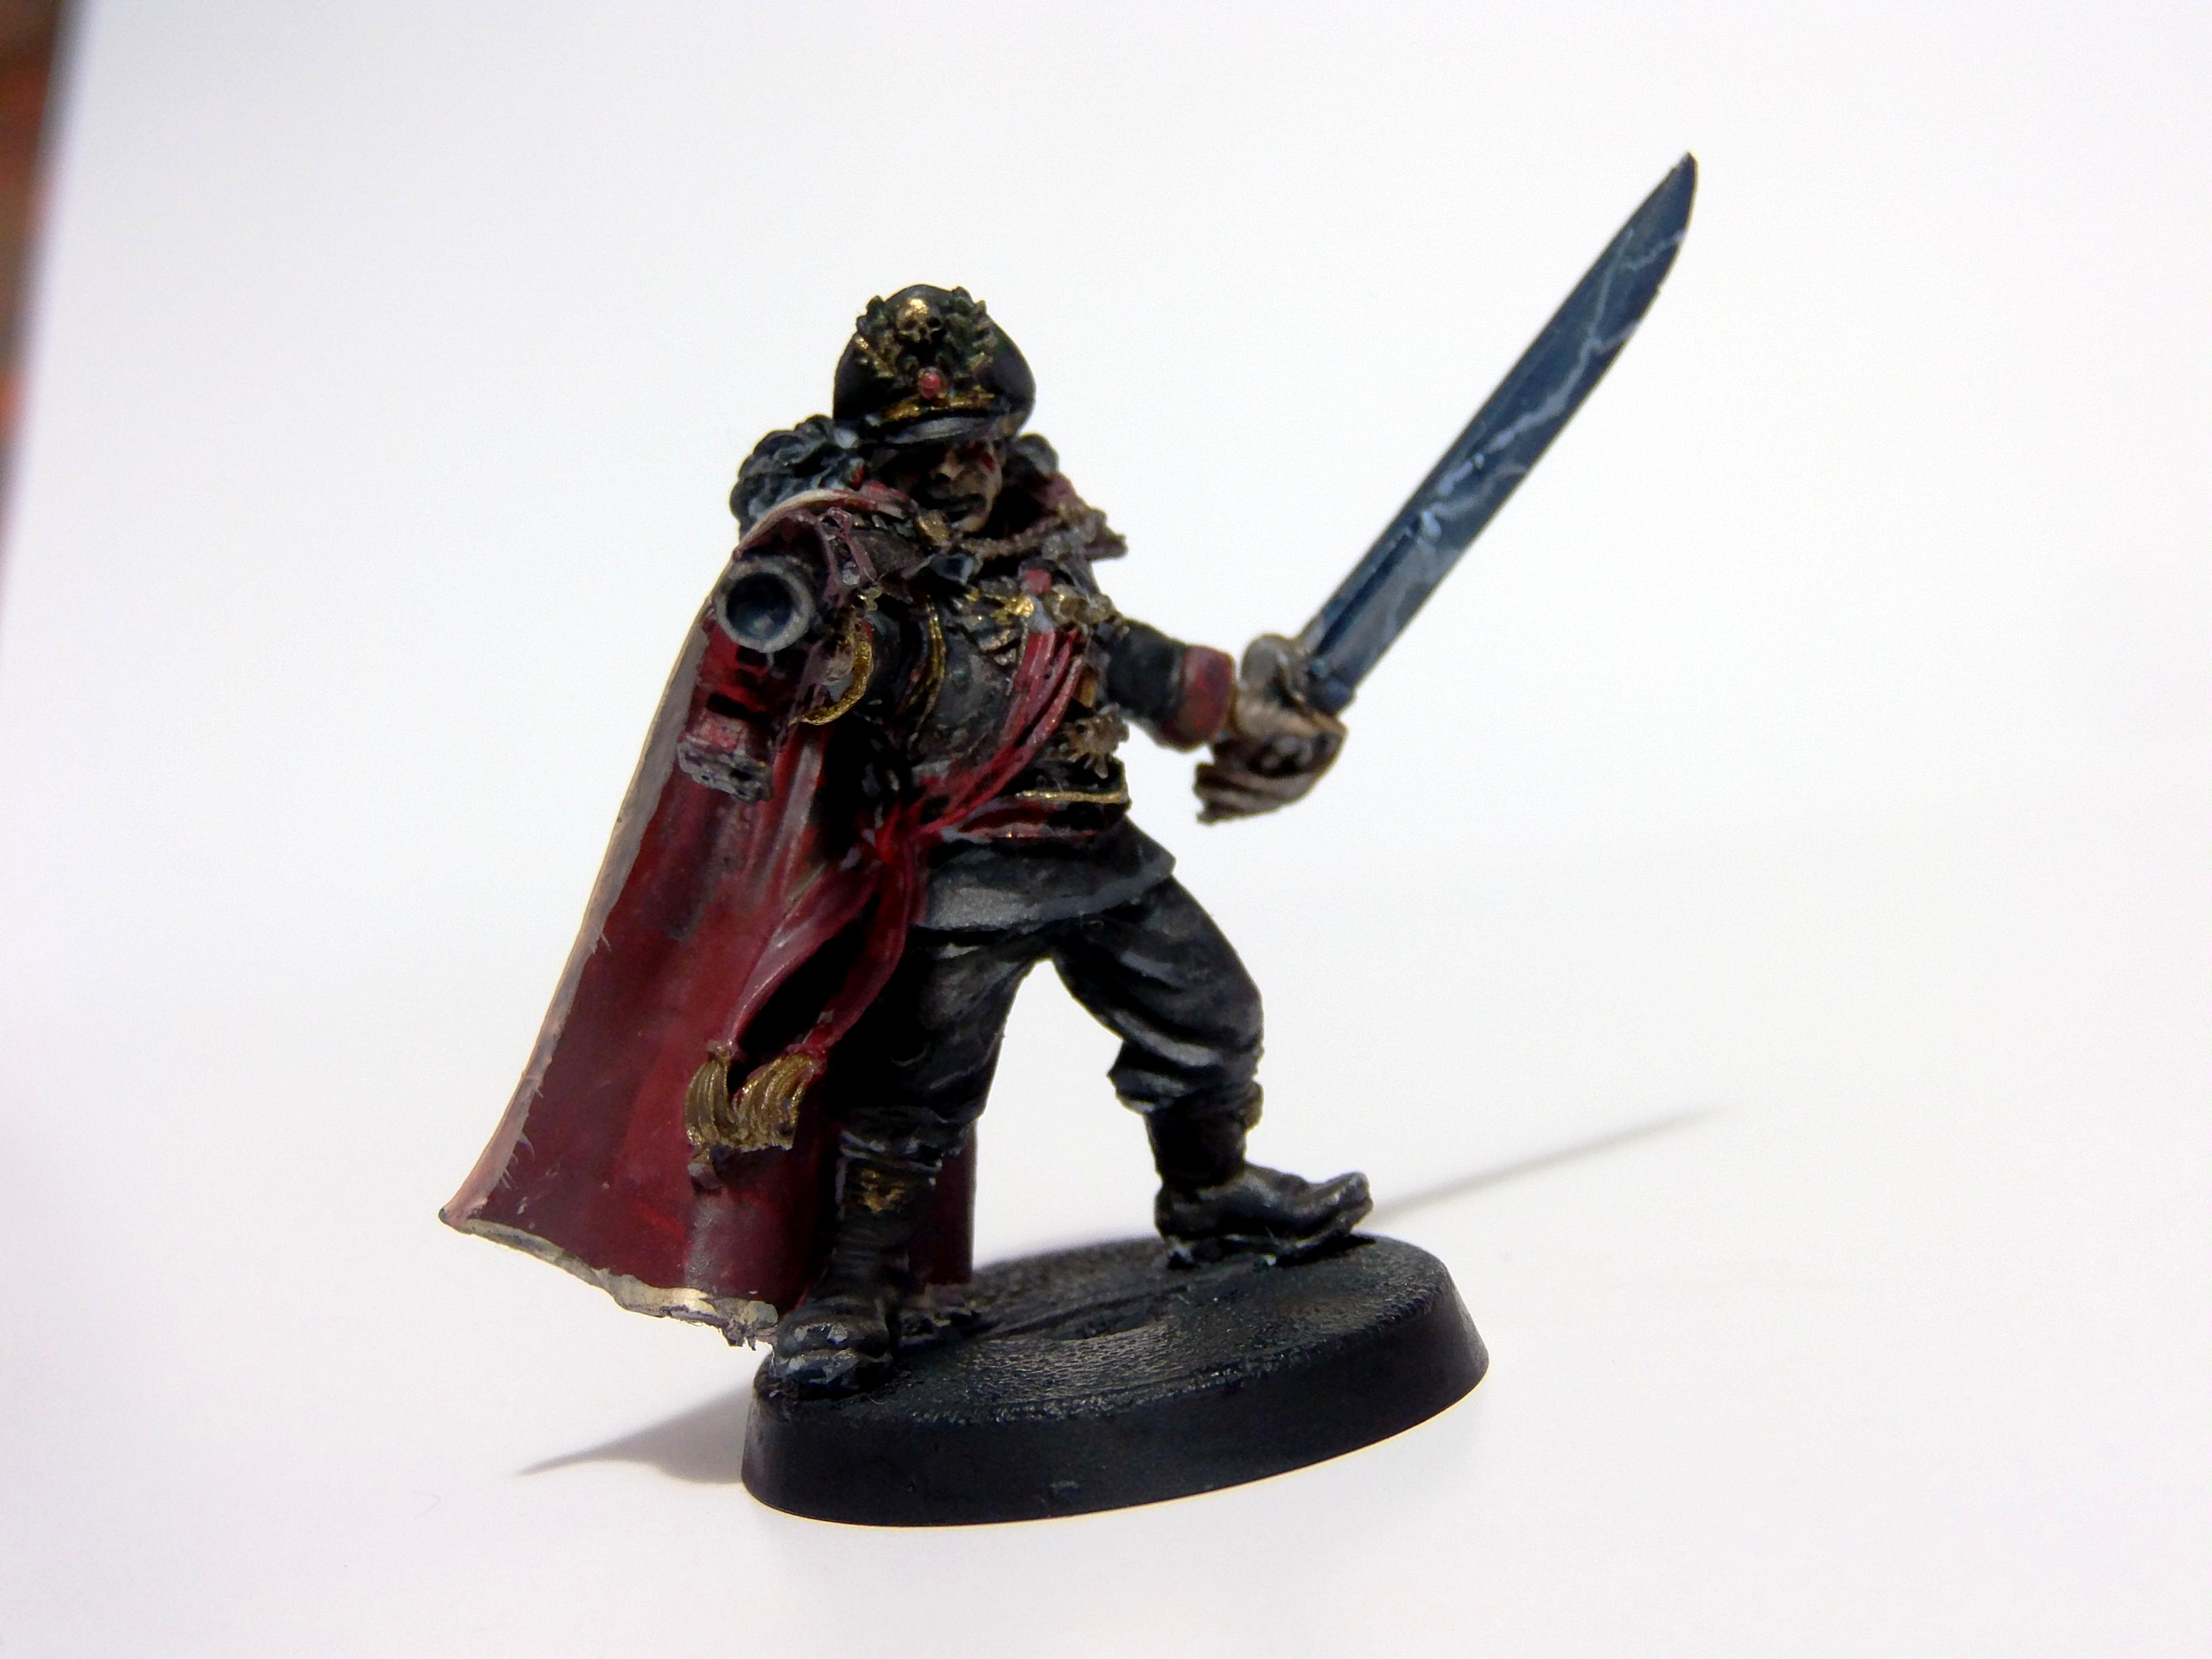 Astra Militarium, Commissar, Imperial Guard, Power Sword, Warhammer 40,000